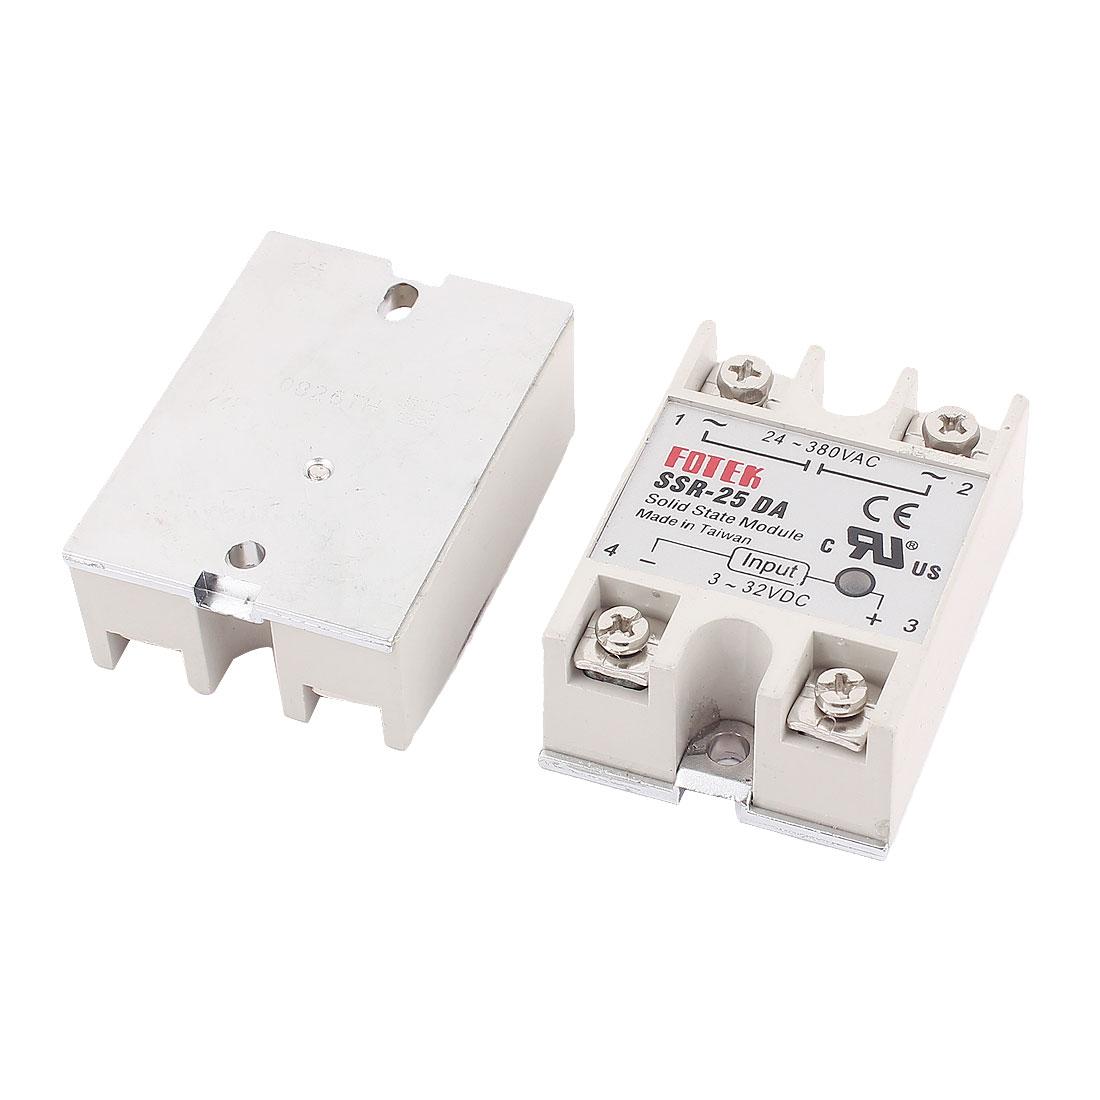 2Pcs Solid State Module SSR-25DA 3-32VDC 24-380VAC for PID Temperature Controller